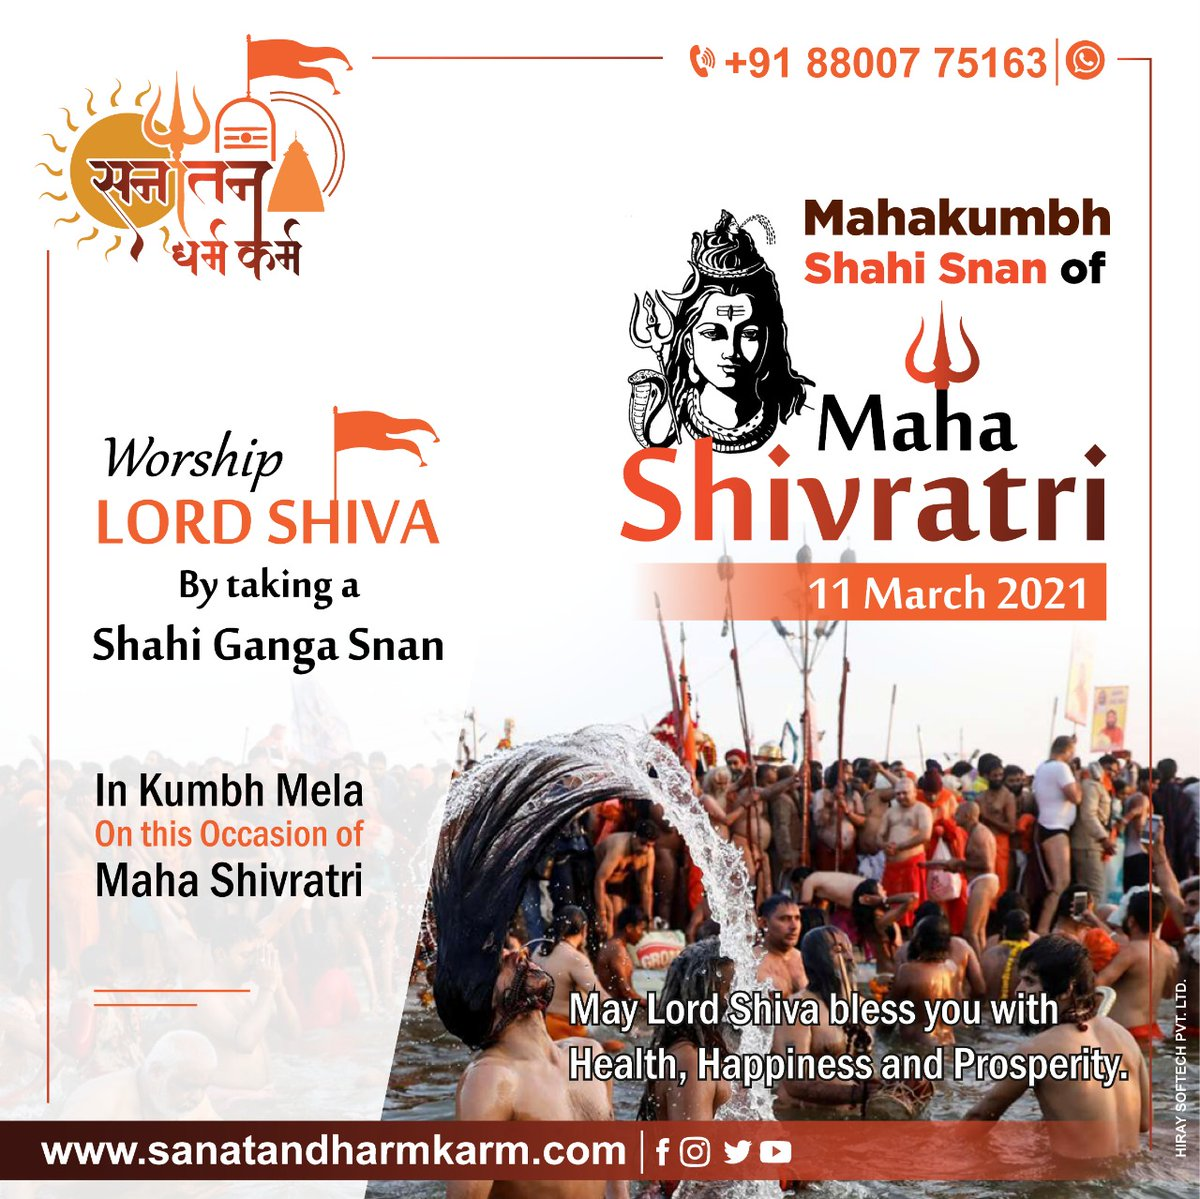 #sanatandharmkarm Worship LORD SHIVA by taking shahi ganga snan in kumbh mela on this occasion of Maha Shivratri! Mahakumbh Shahi Snan - Maha Shivratri 11 March 2021.  #mahashivratri #lordshiva # #shahisnan #umamaheshwarsevatrust #junaakhada  #uttarakhand #haridwar #mahakumbh